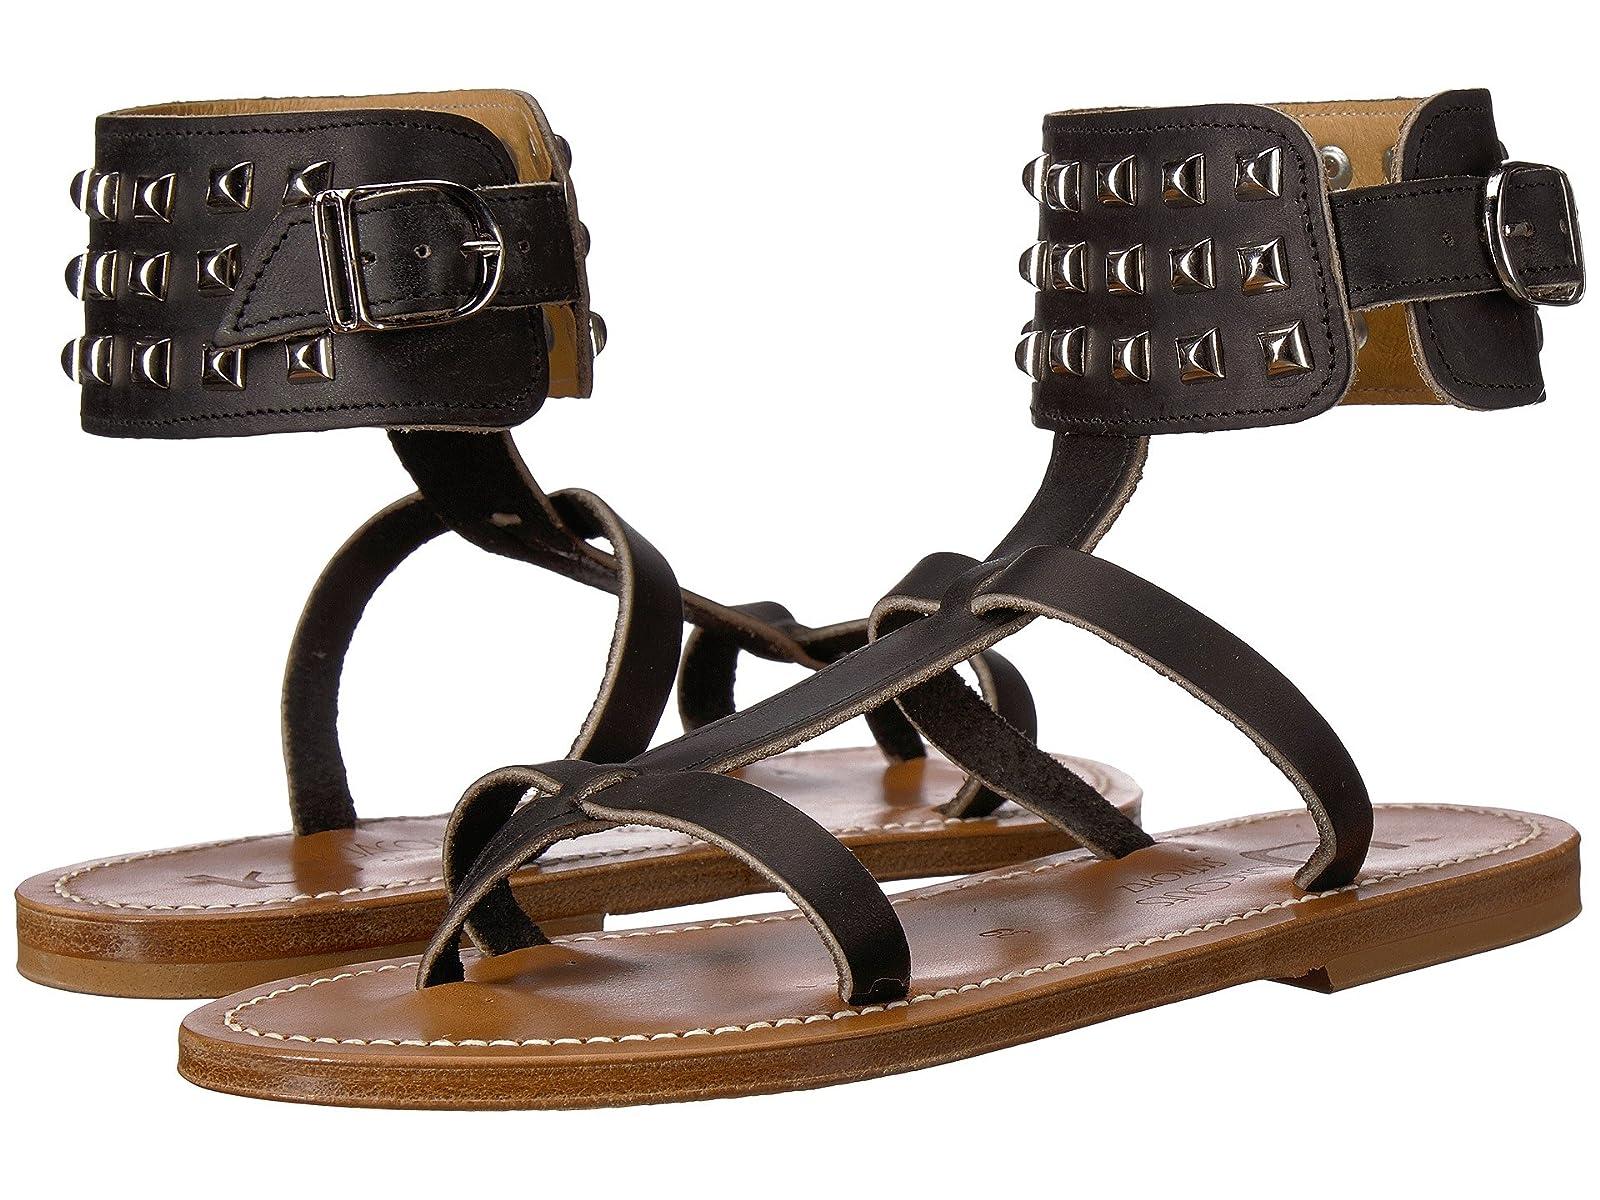 K.Jacques Forban Pul SandalAtmospheric grades have affordable shoes